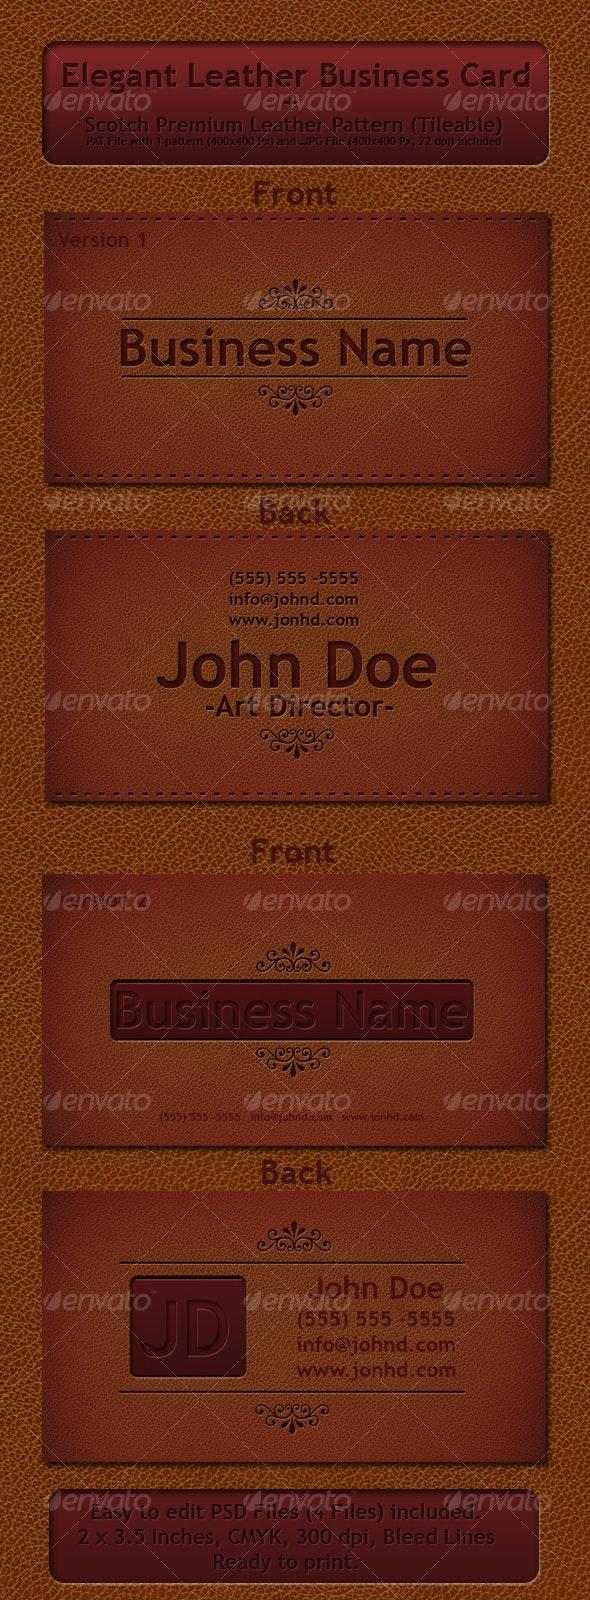 Elegant Leather Business Card - Retro/Vintage Business Cards